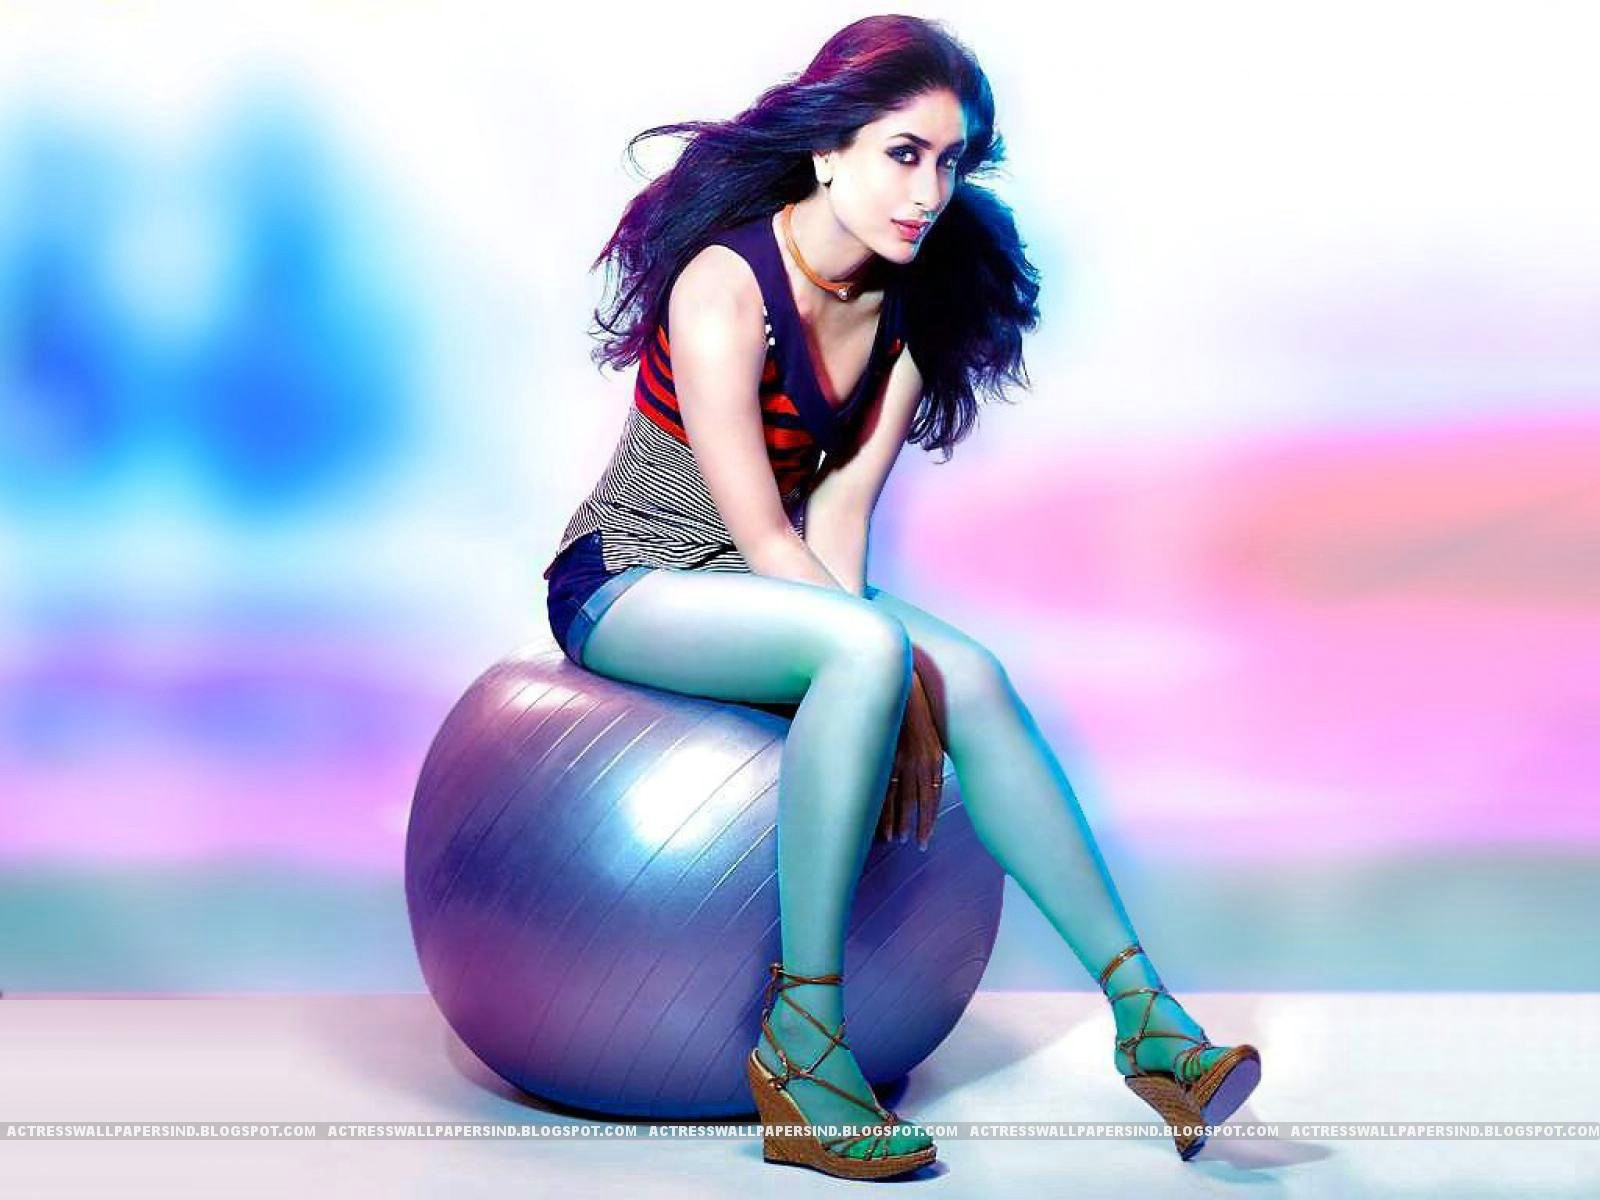 Kareena Kapoor Sexy Photo Hd Shoot Full Gallery - A Wind-6406